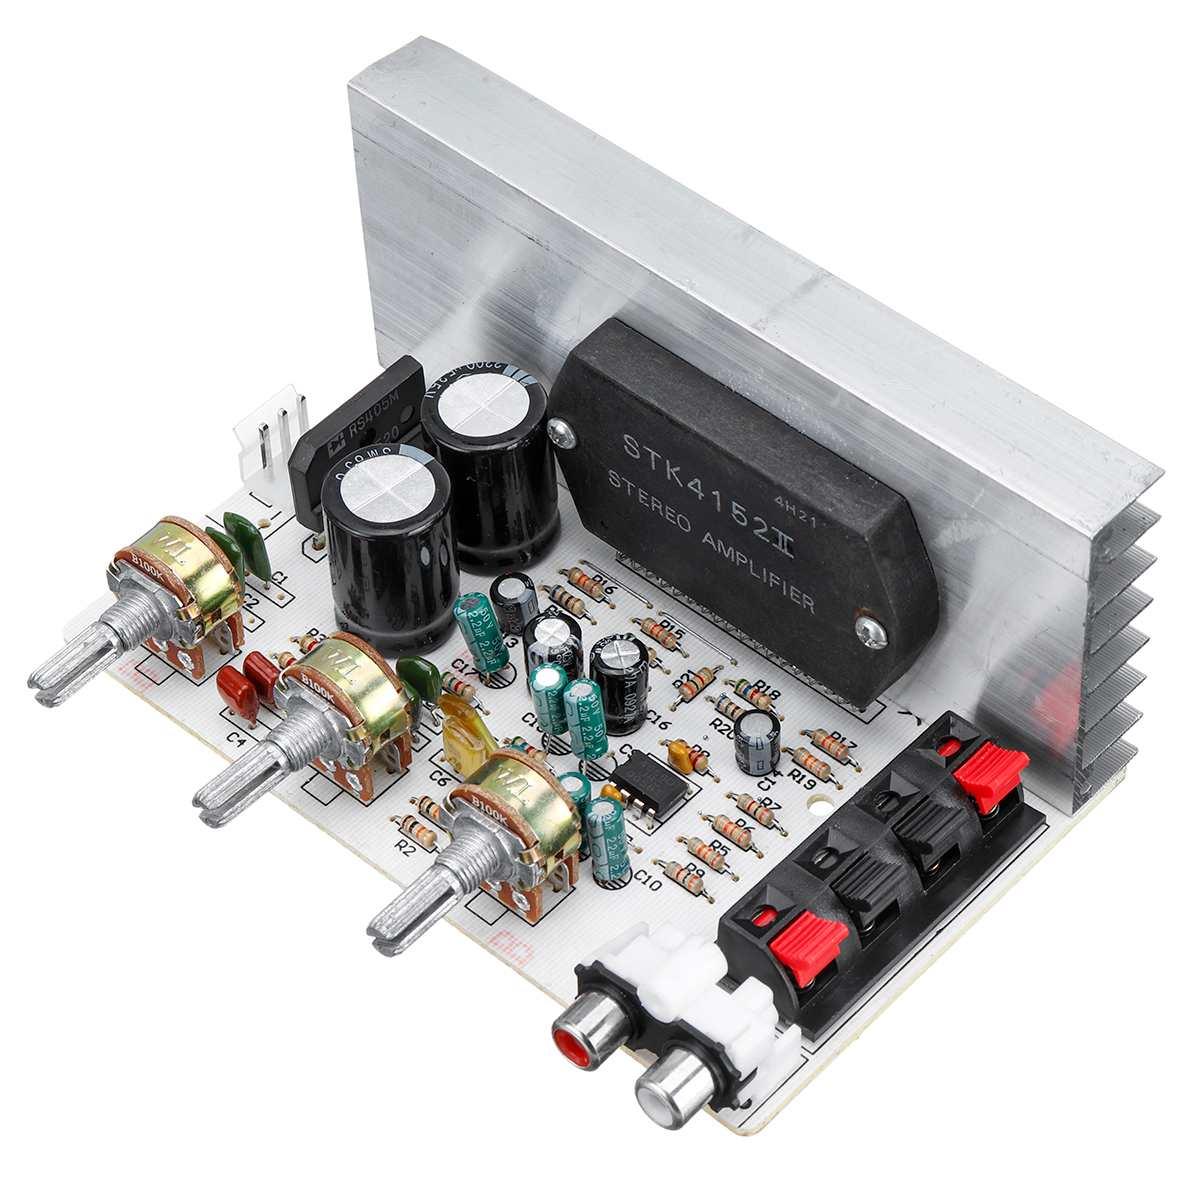 Placa amplificadora de 50W + 50W STK4132 DX-0408 placa amplificadora serie de película gruesa STK de 2,0 canales 10 HZ-20 KHZ doble AC15-18V alta potencia